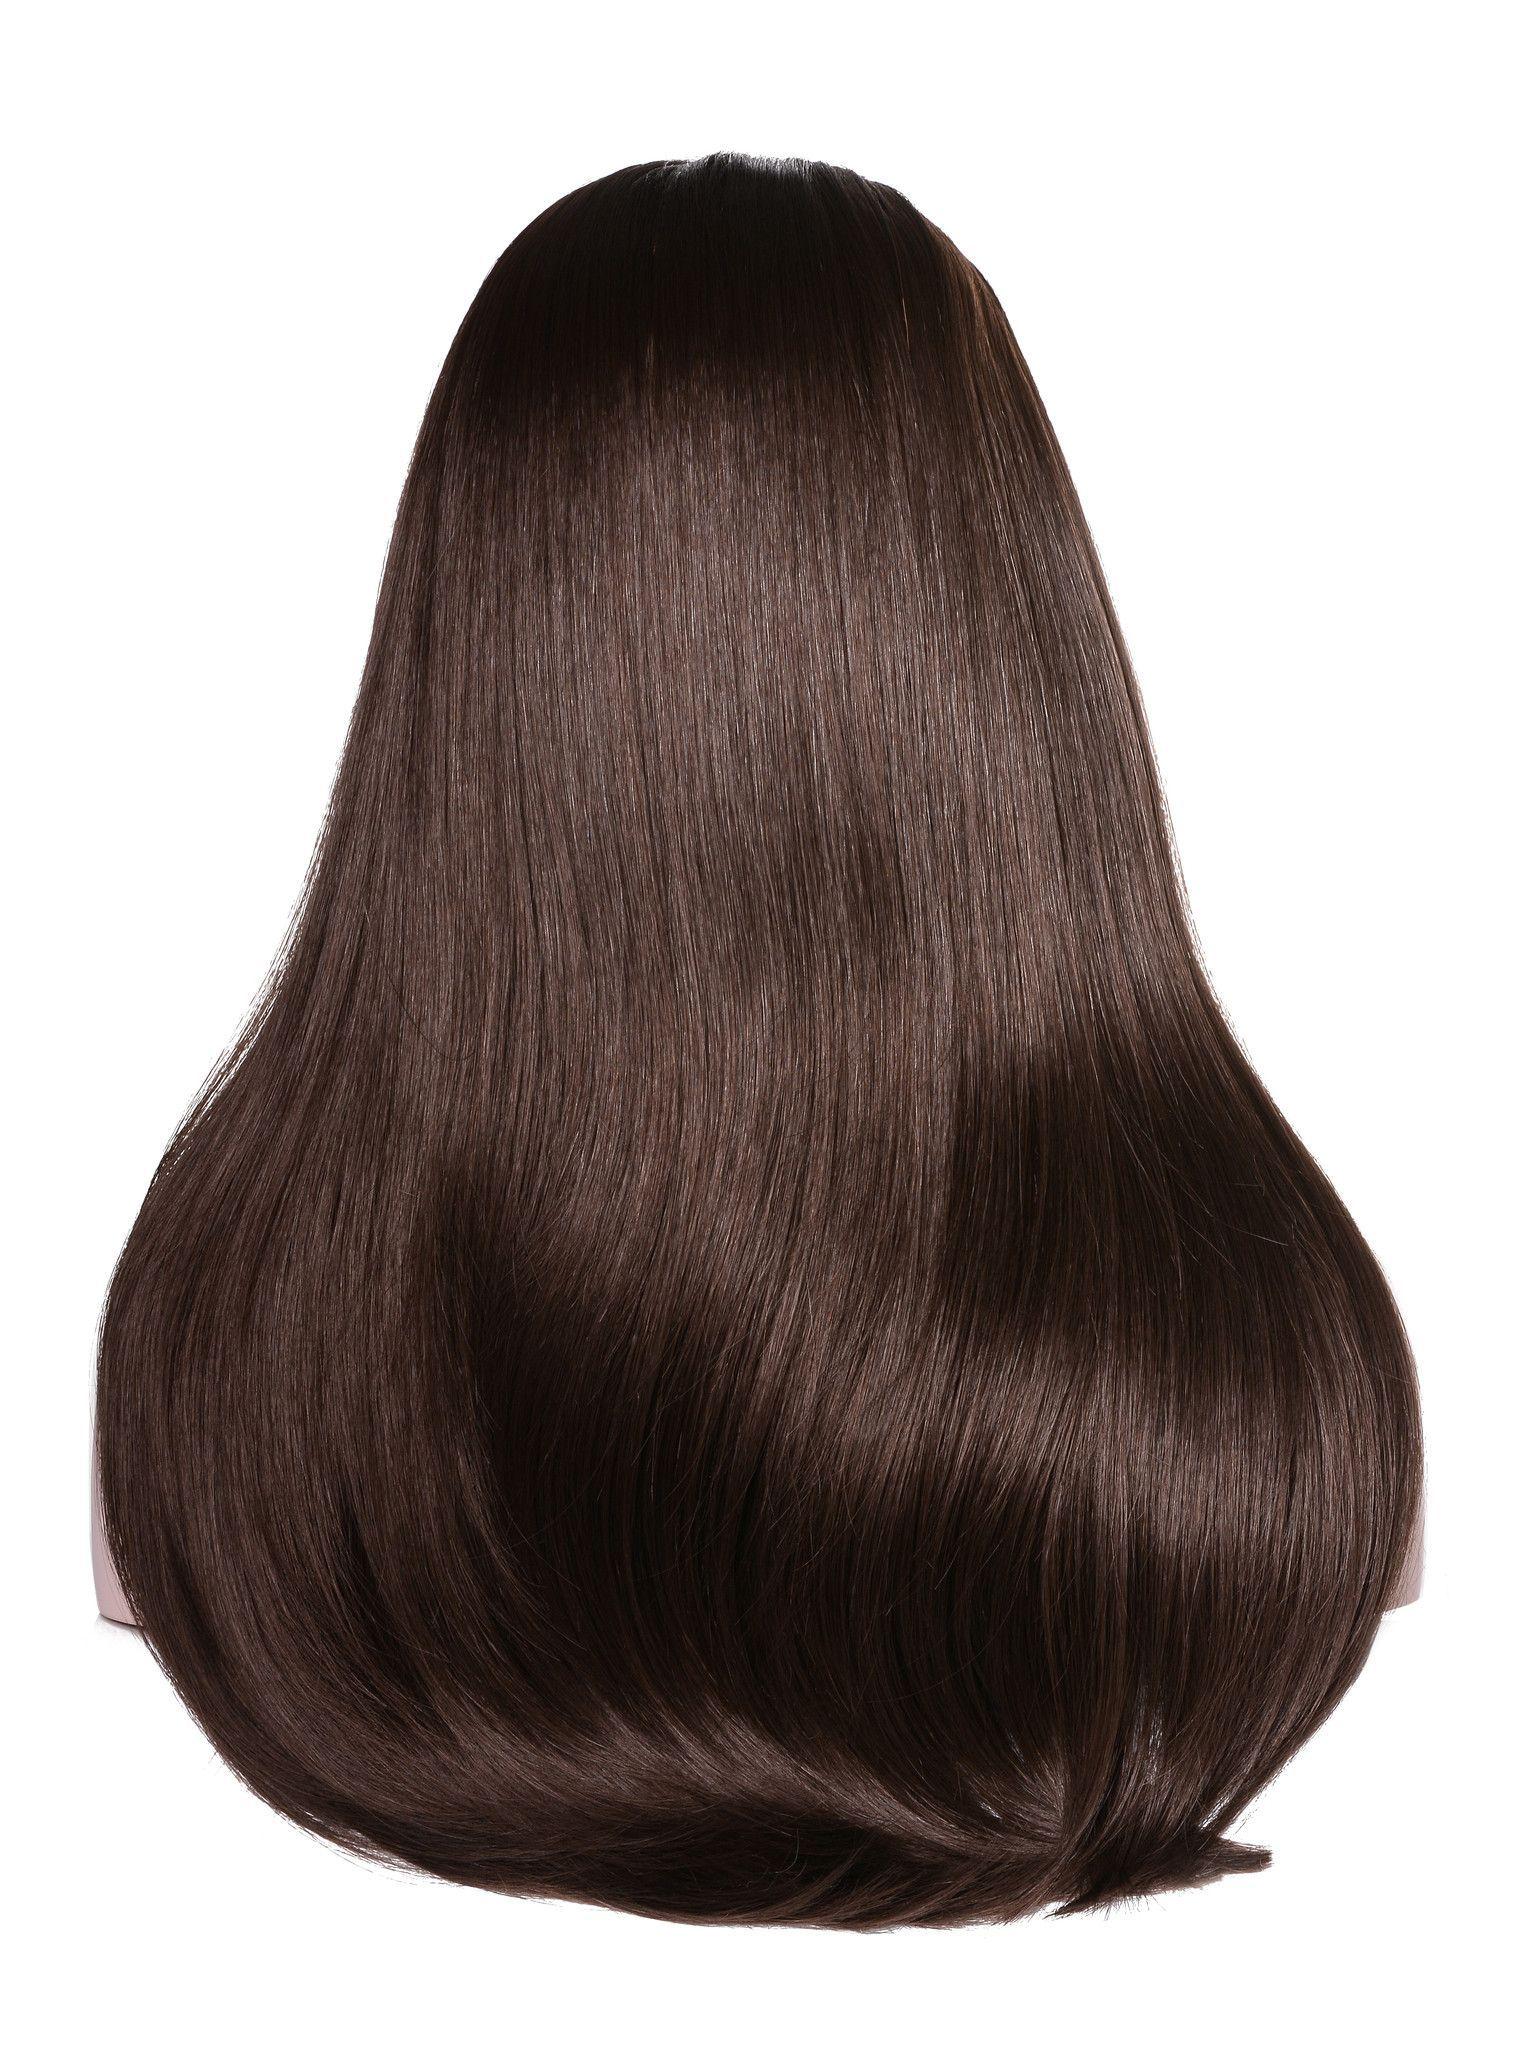 Mens haircut tutorials mix long  womenus wigs hairpiece straight hair piece with